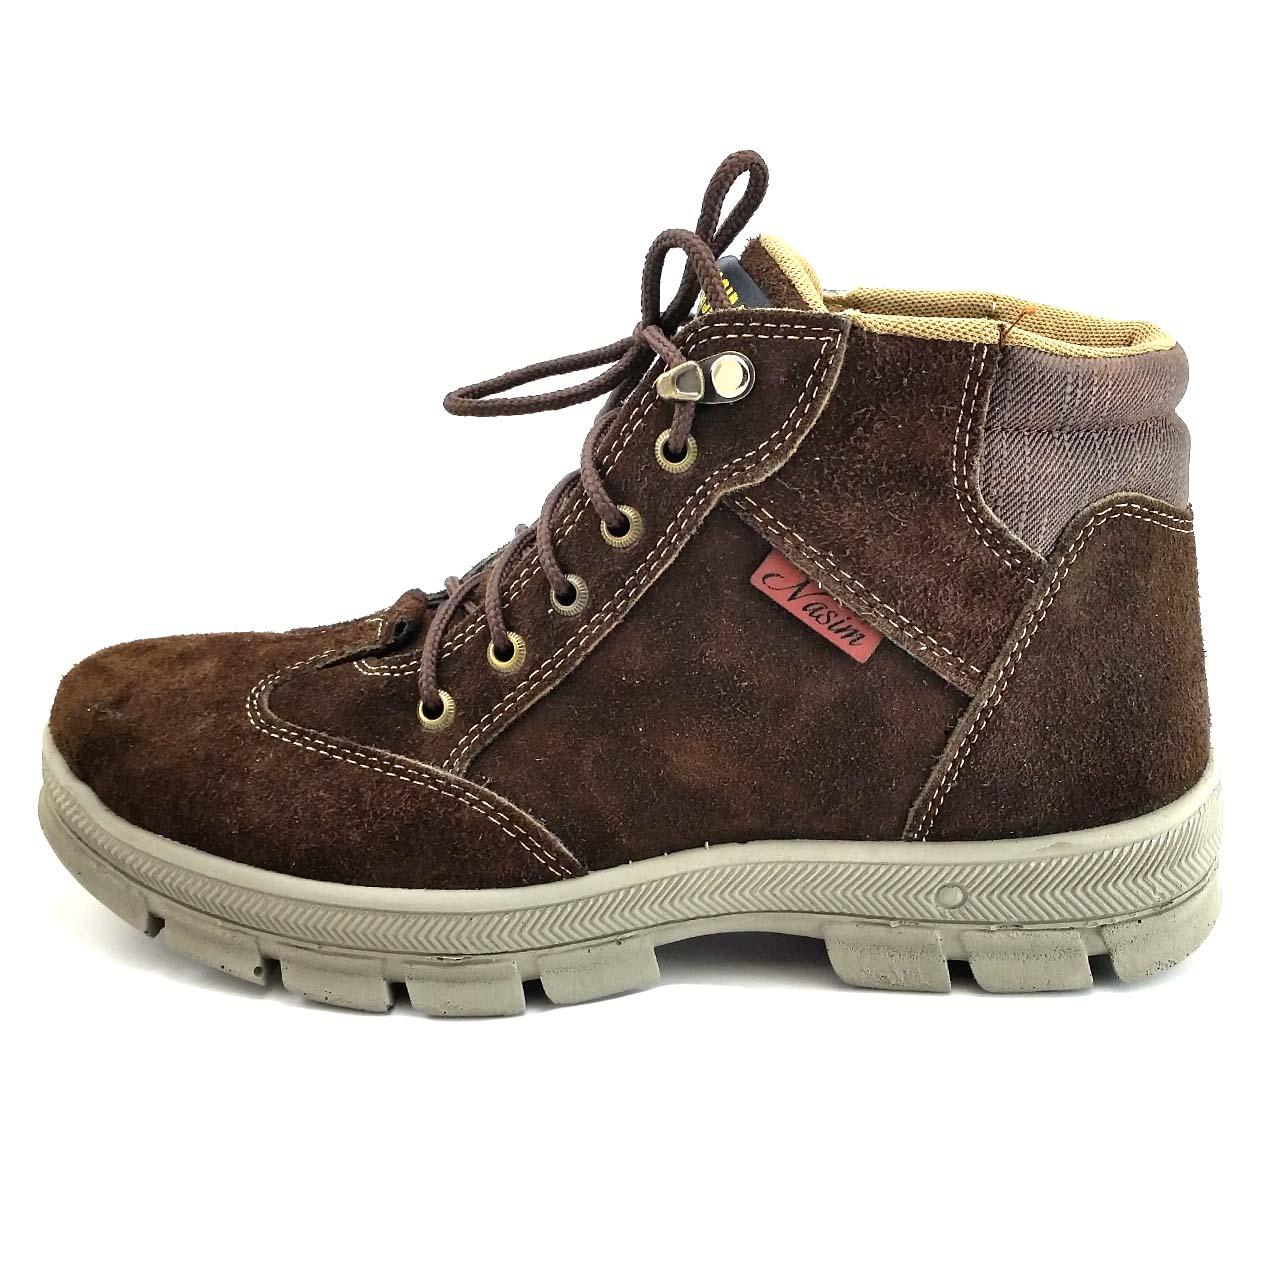 خرید اینترنتی                     کفش کوهنوردی مردانه نسیم مدل میلان کد 3030